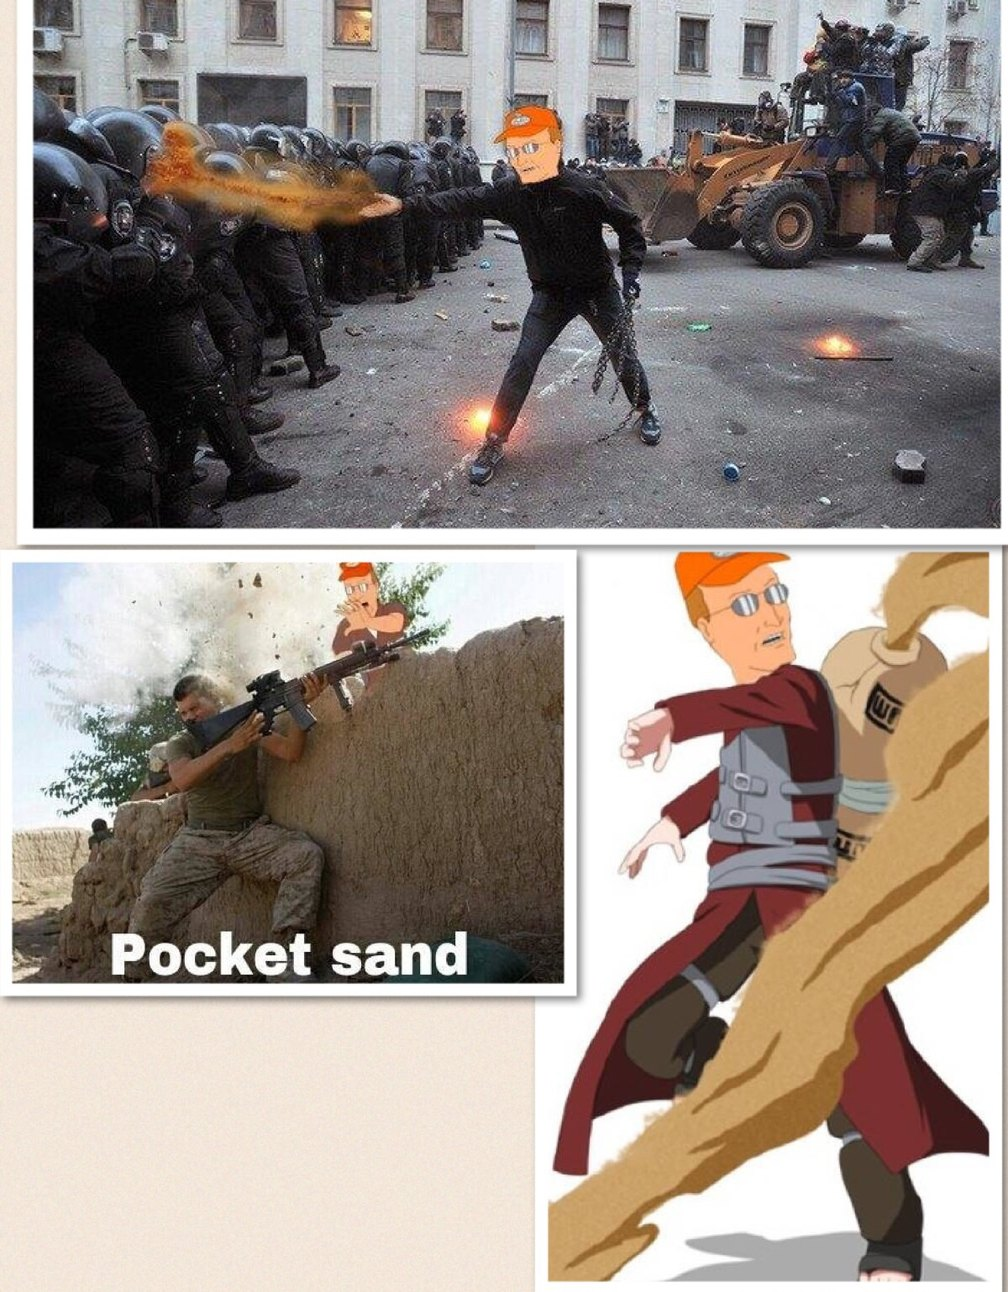 When in doubt, POCKET SAND! - meme